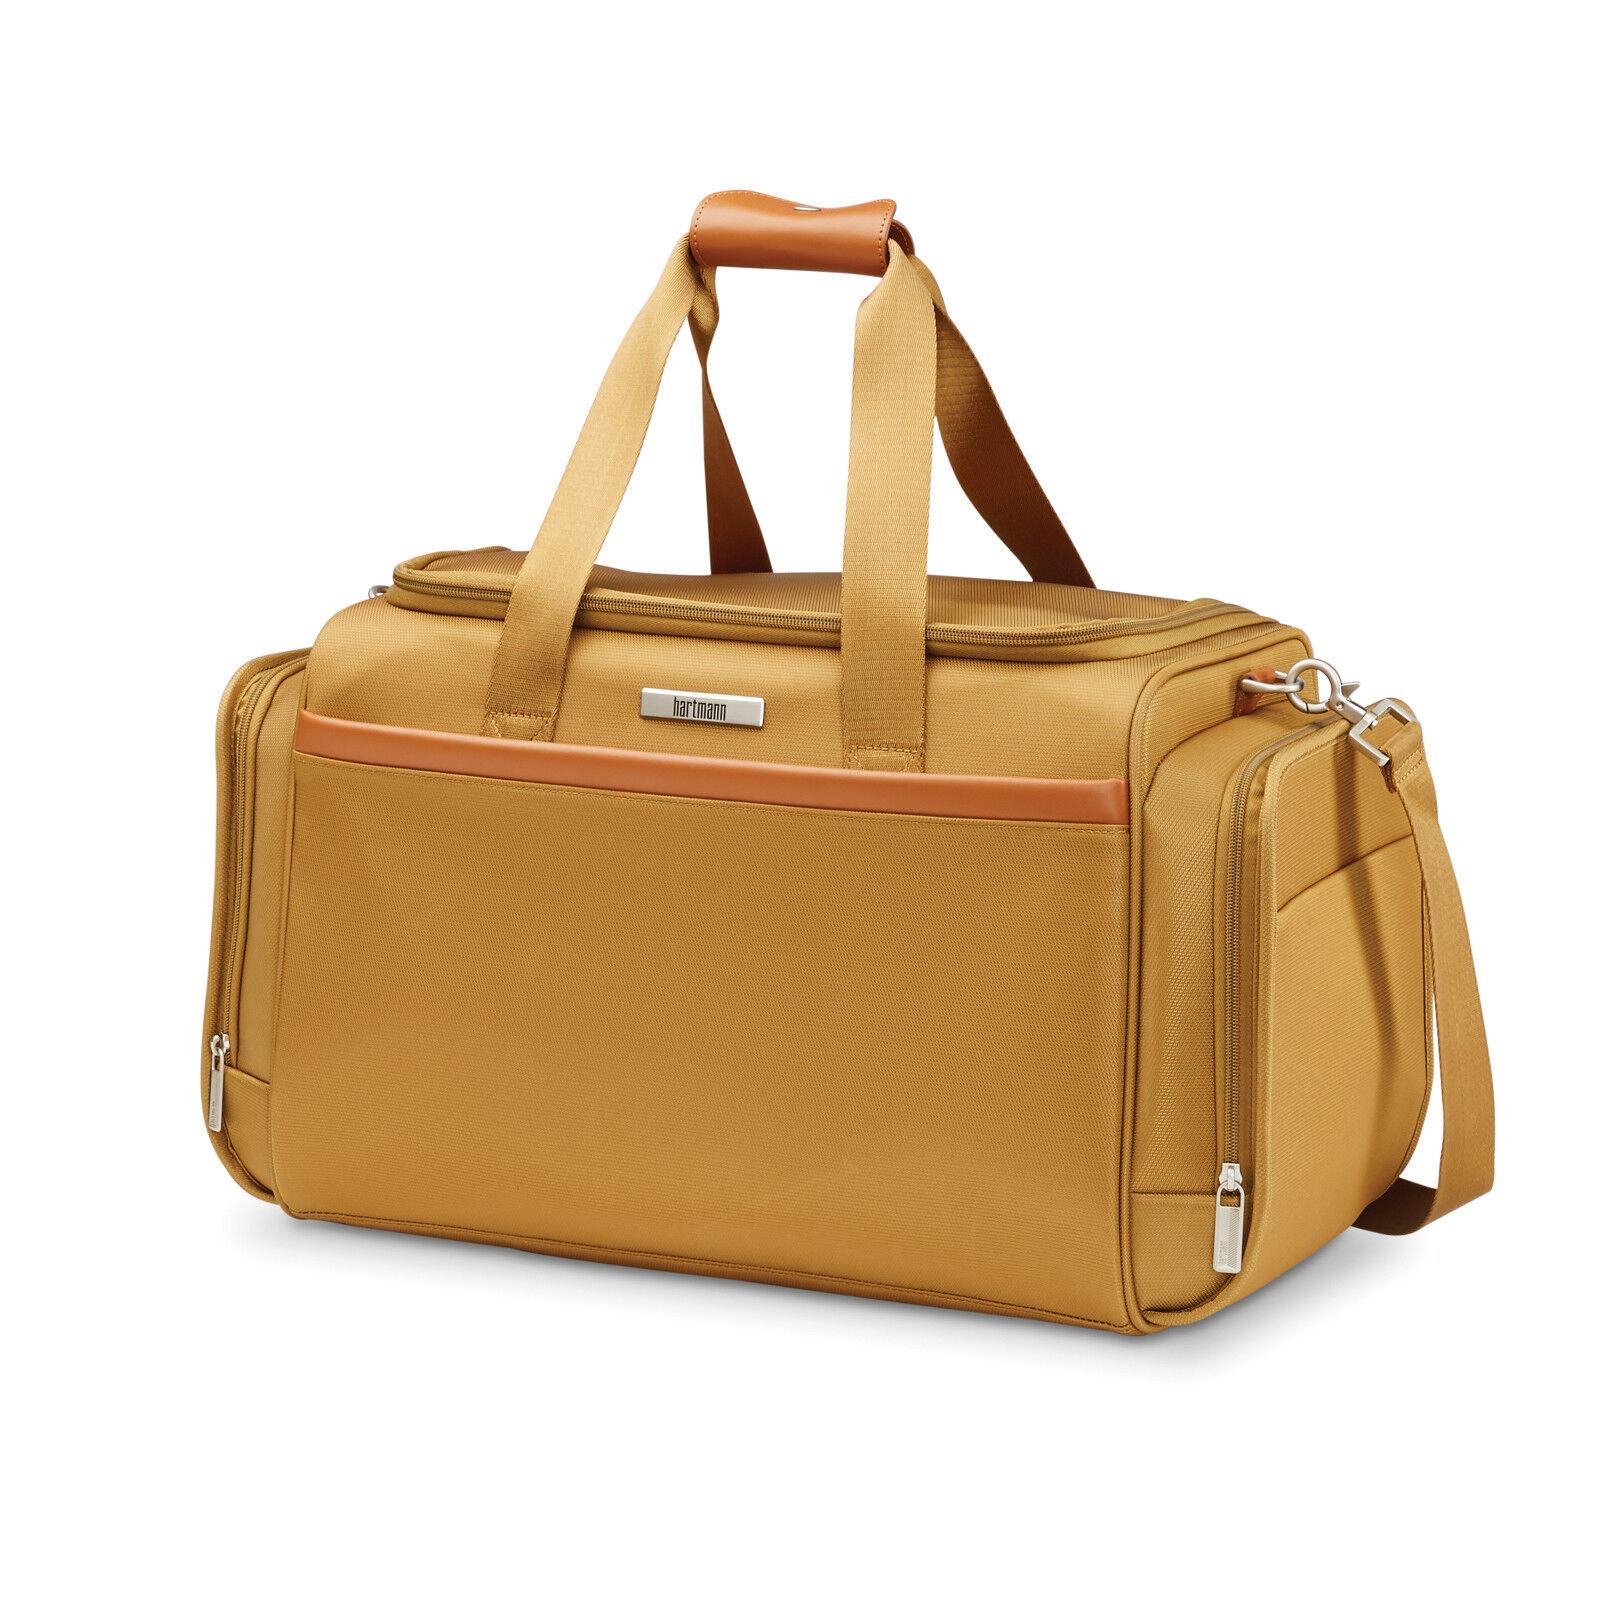 Hartmann Luggage Metropolitan 2 Travel Duffel - Safari